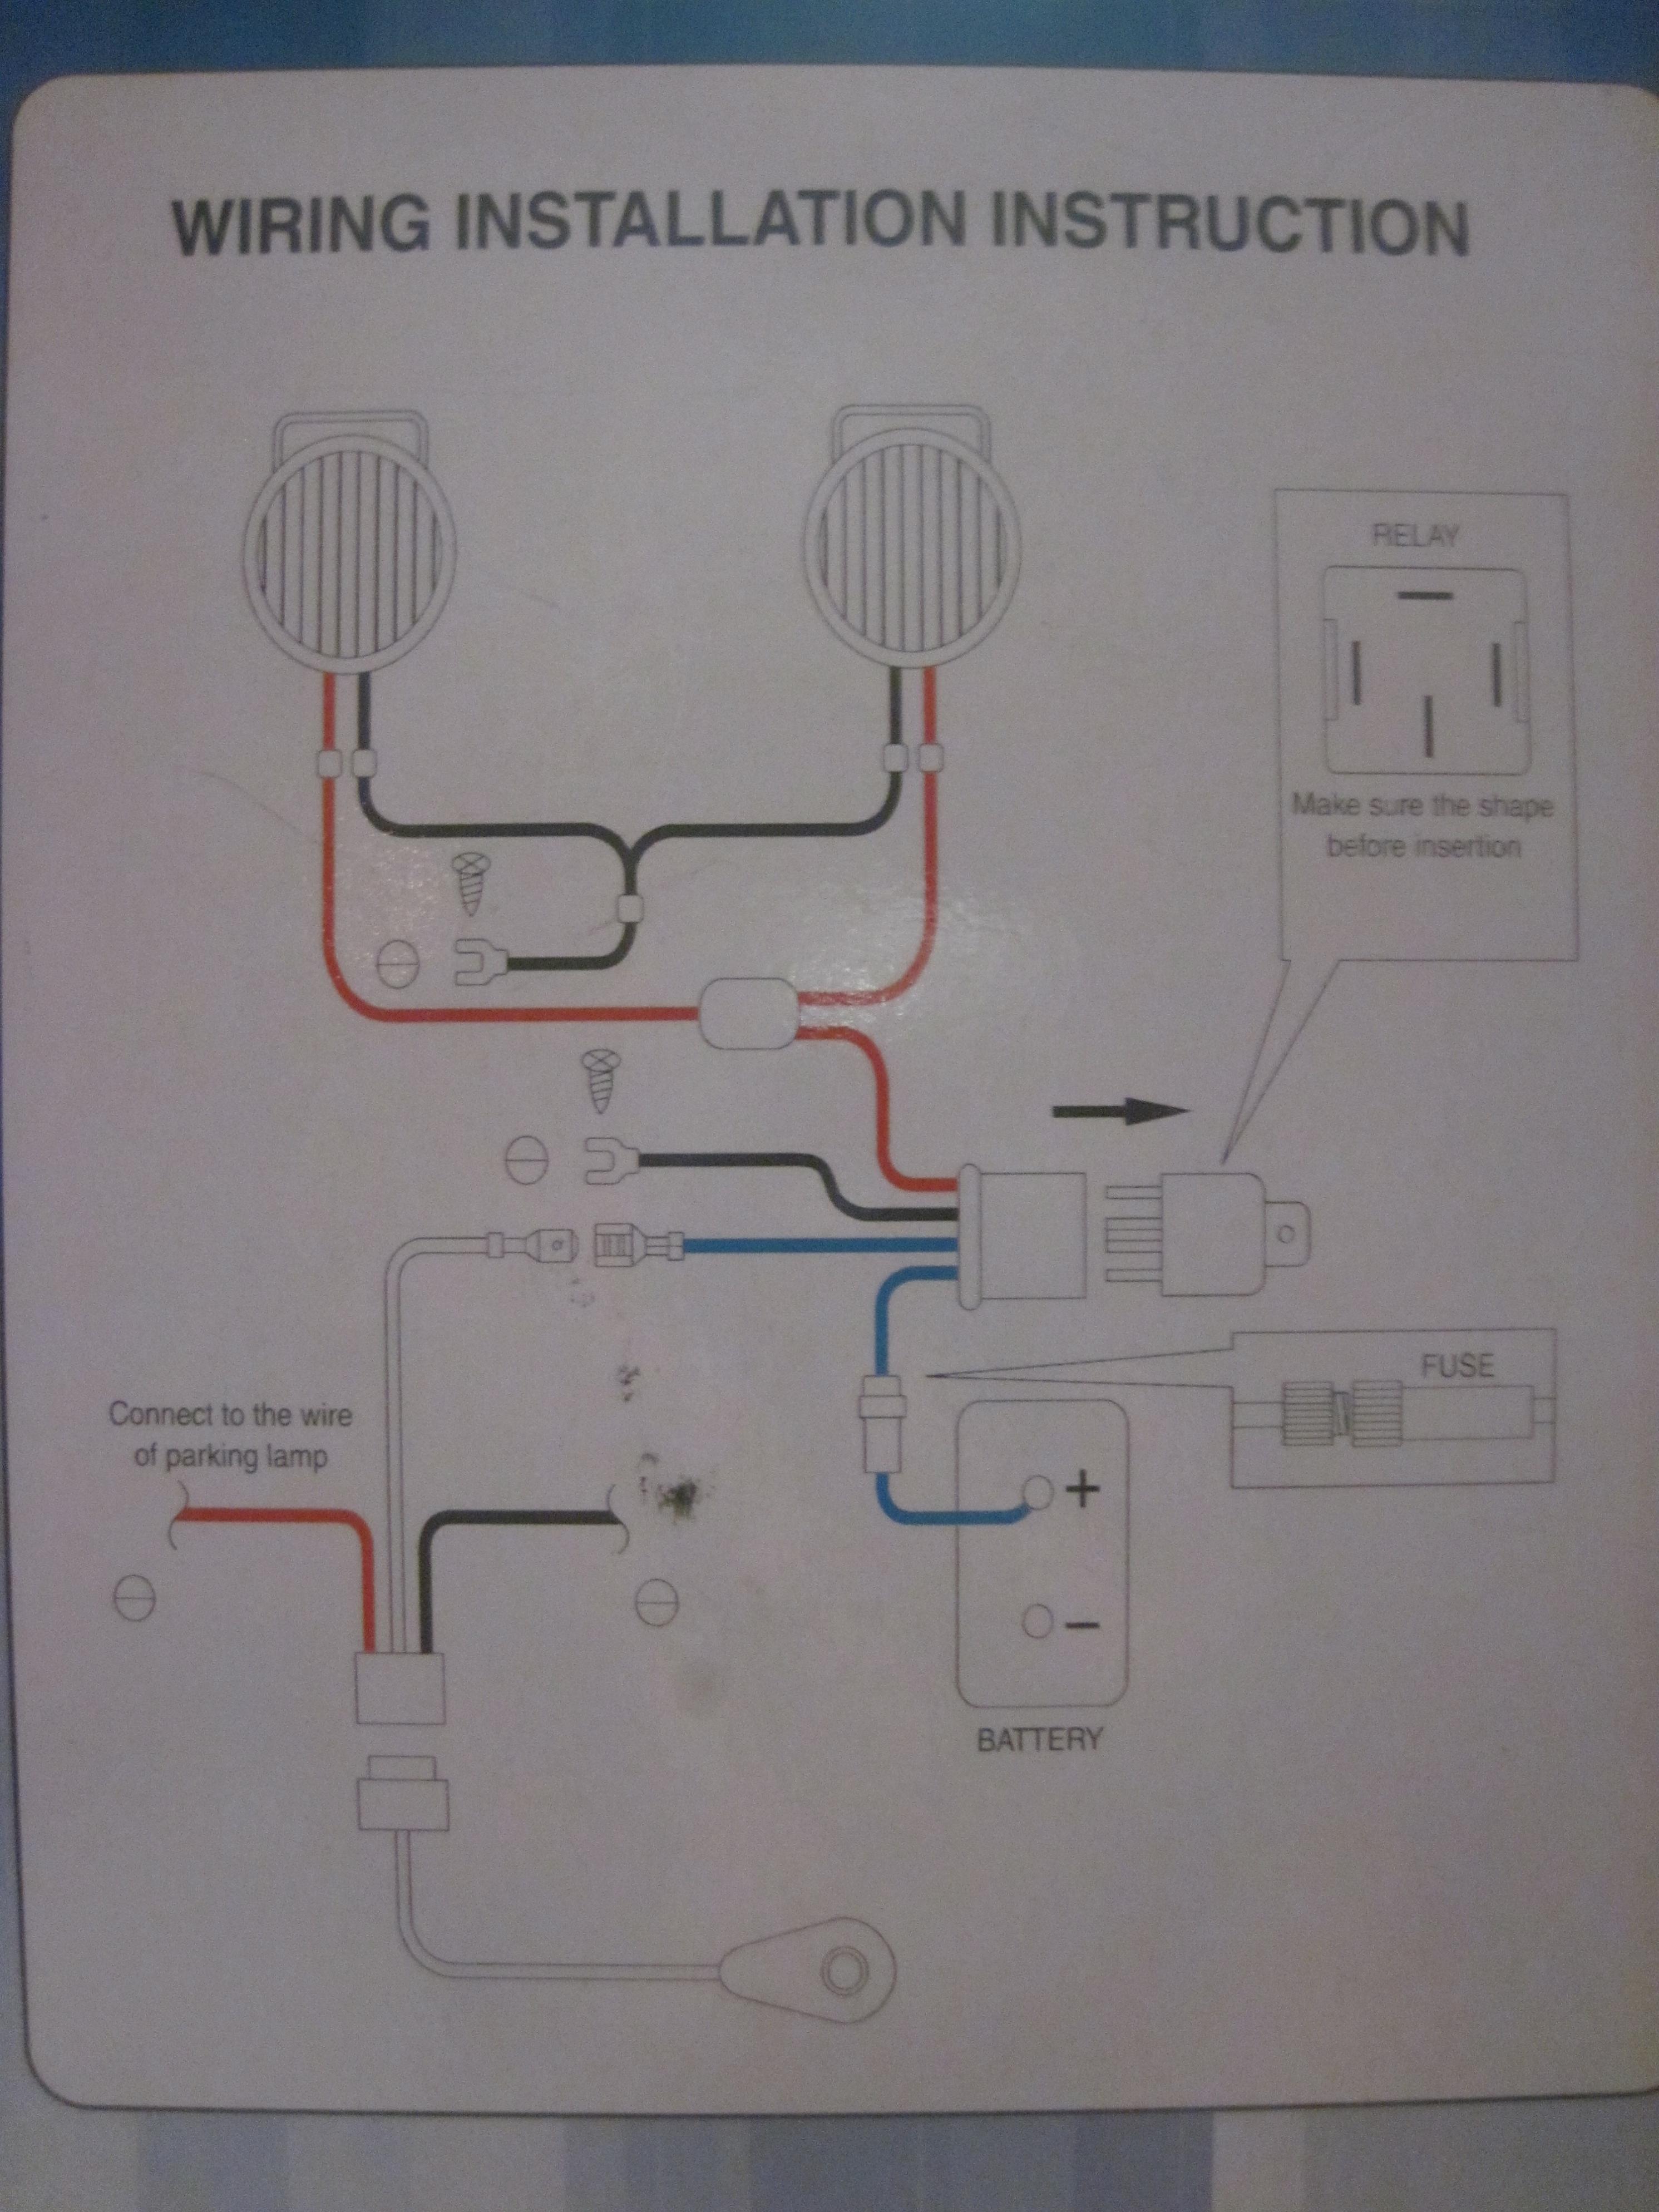 Help: Wiring Vision X lights | Kawasaki Teryx ForumKawasaki Teryx Forum